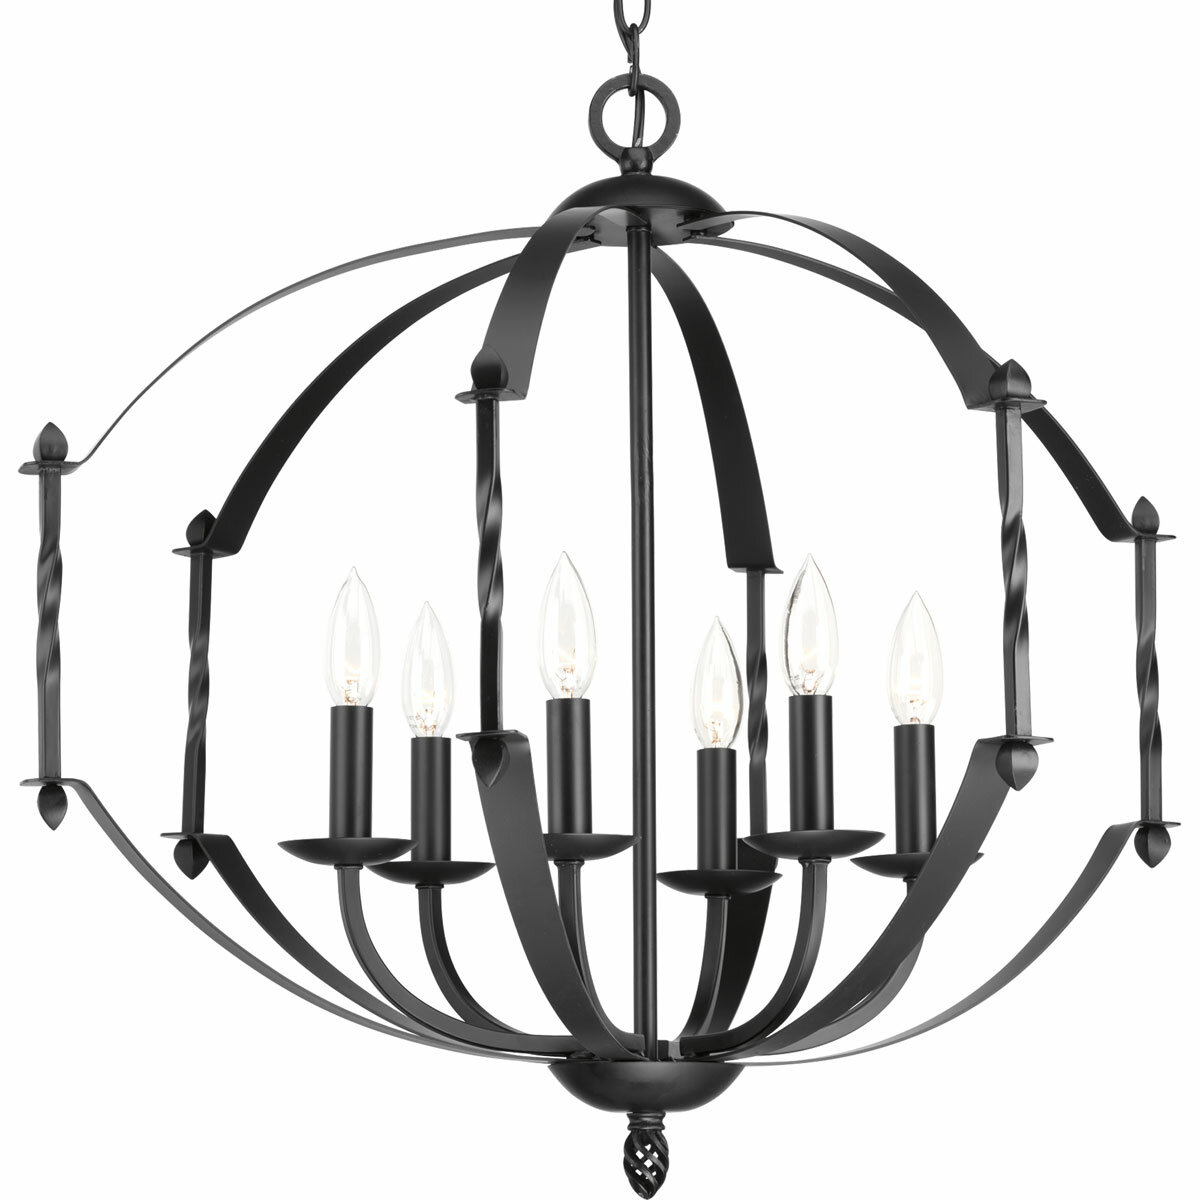 Alcott Hill Mehl 6 Light Candle Style Geometric Chandelier Wayfair